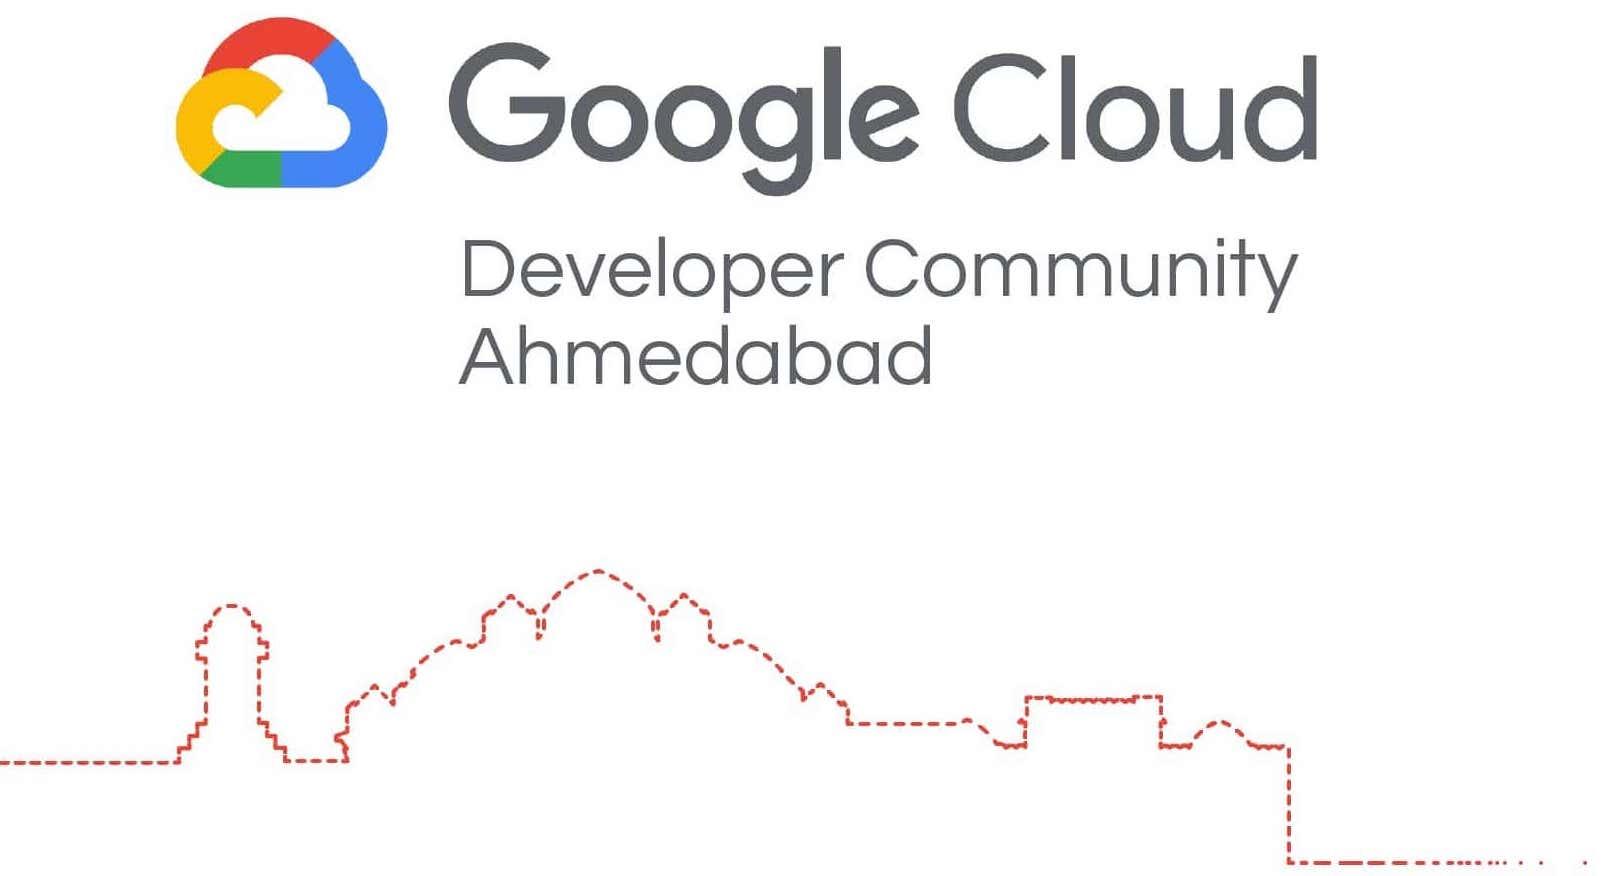 Google Cloud Developer Community